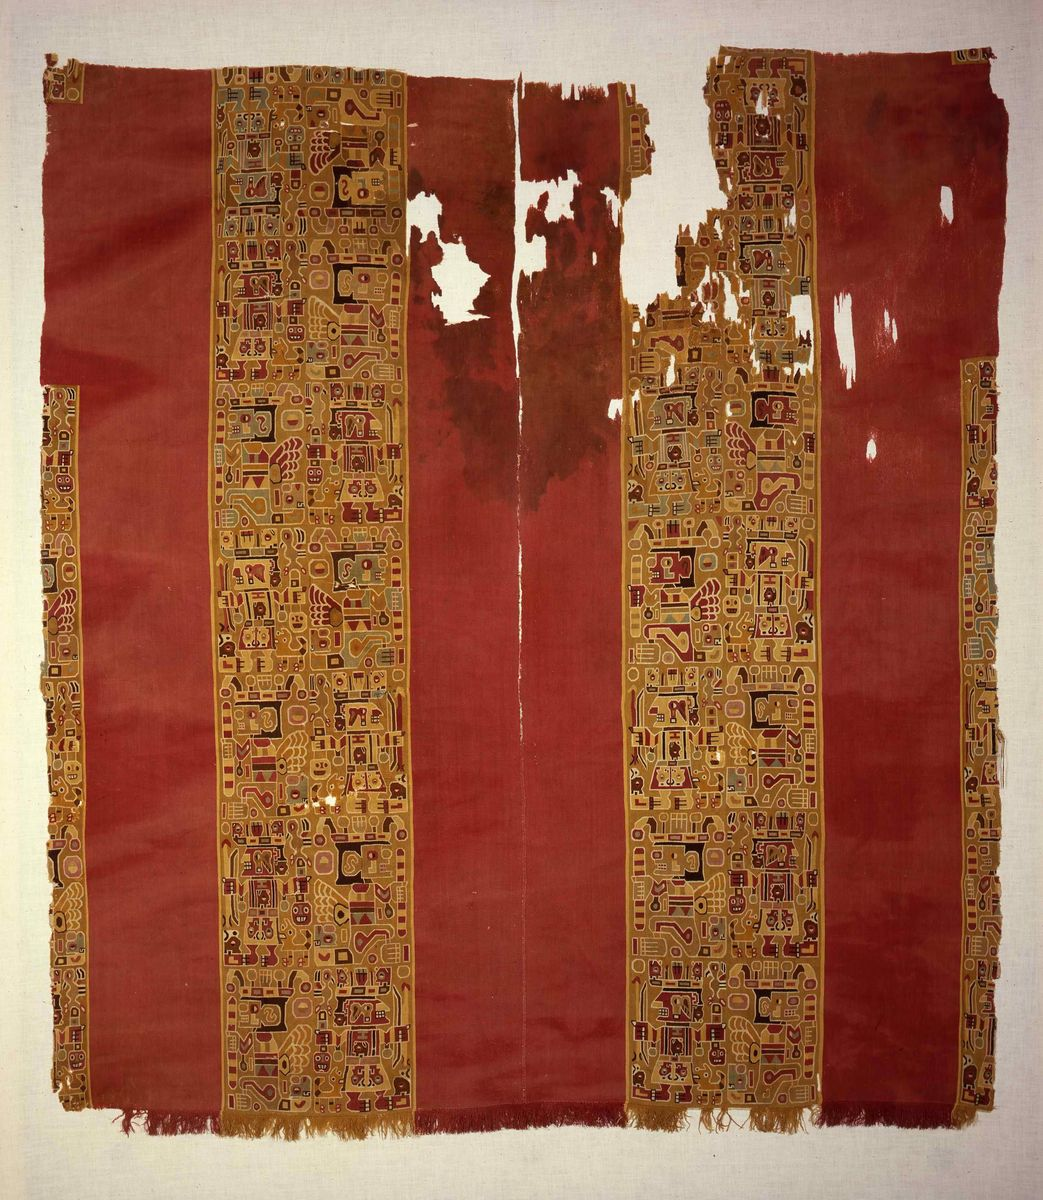 Männerhemd (Uncu), Huari (Wari) 500 - 800, Peru © Staatliche Museen zu Berlin, Ethnologisches Museum, Foto: Dietrich Graf